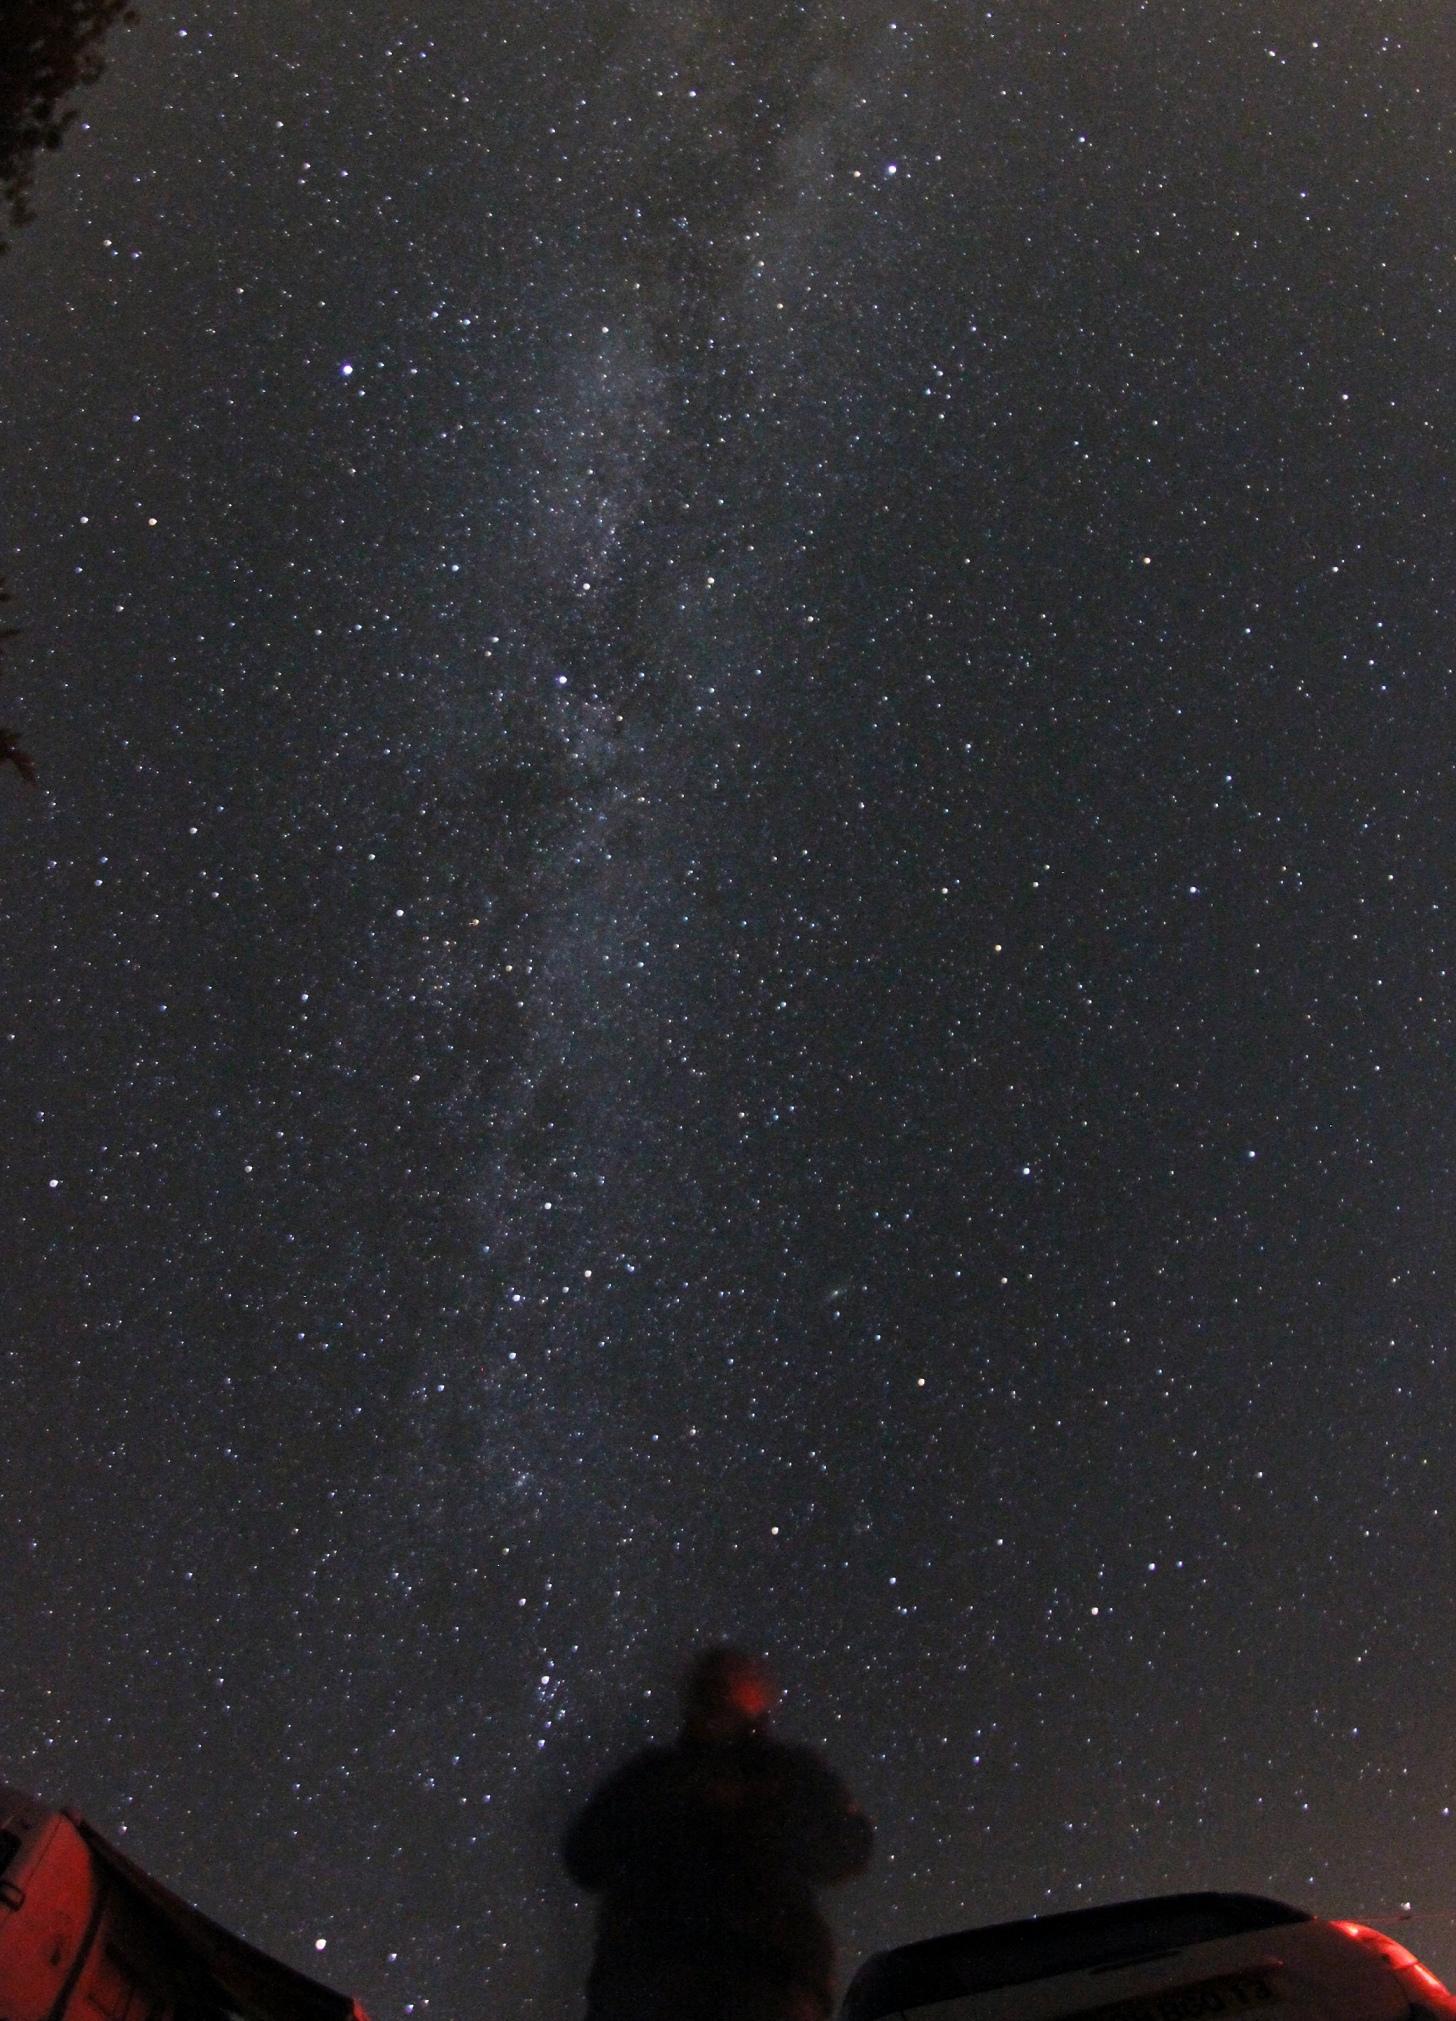 http://ekladata.com/5zT3b6sDweBI95pz9f7sWdxnC6o/Saint-Jurs-2016-Voie-Lactee-observateur.jpg